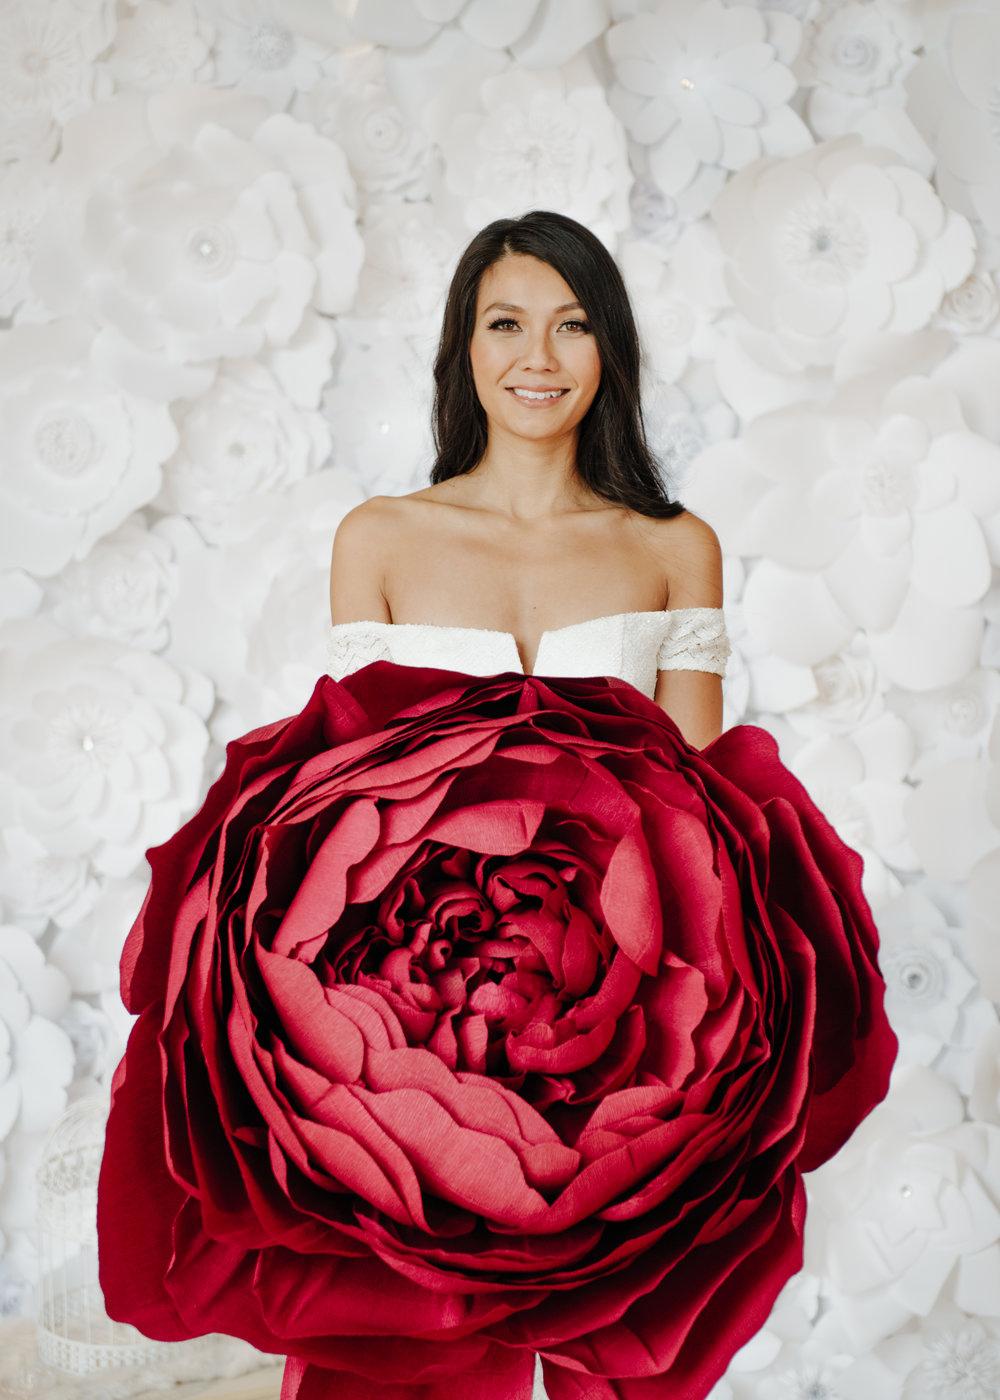 kaoverii_silva_photographer_paper_florist-5.jpg